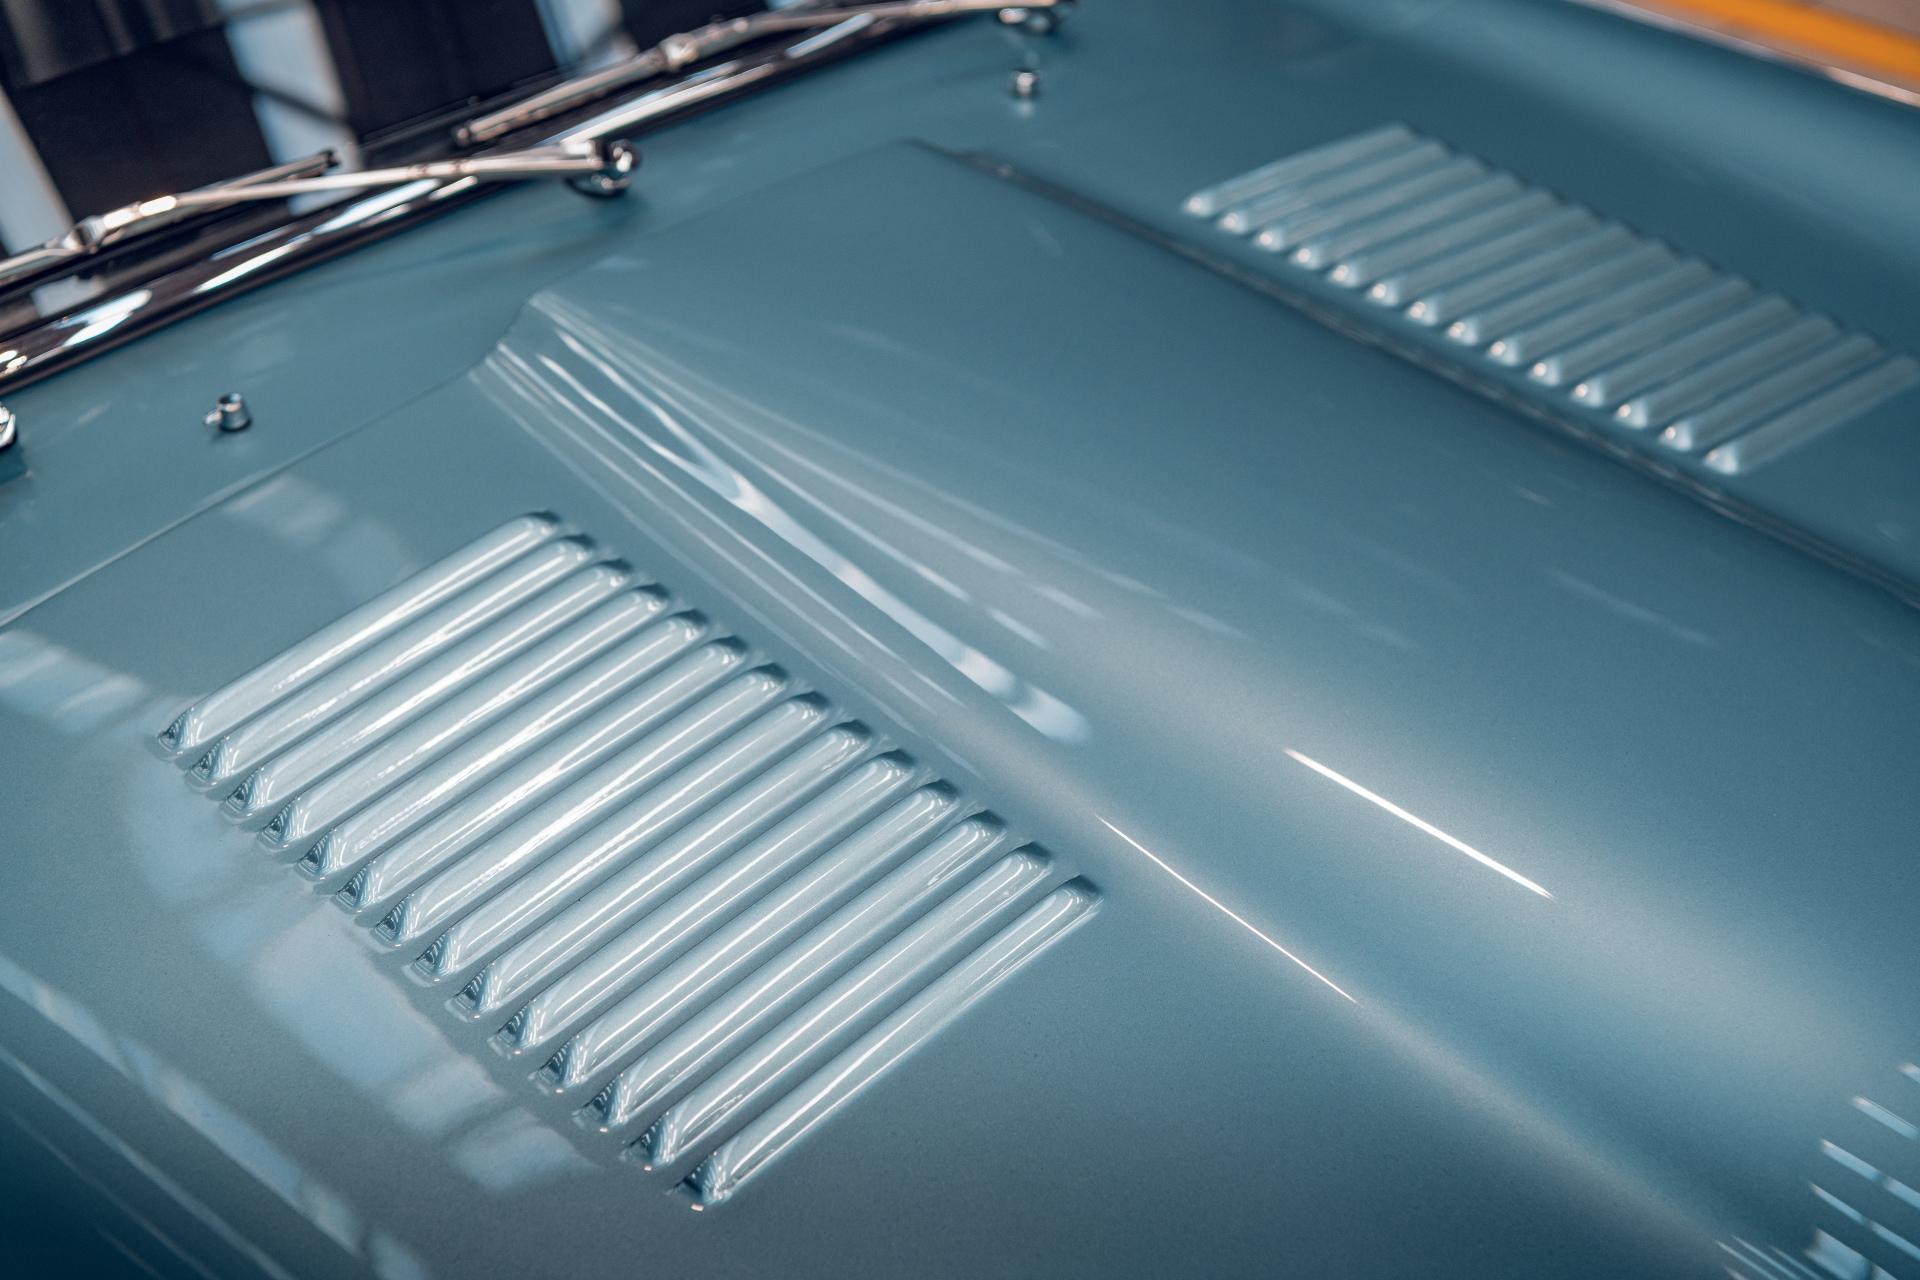 Jaguar E-Type Reborn 1965 Series 1 4.2 hood detail